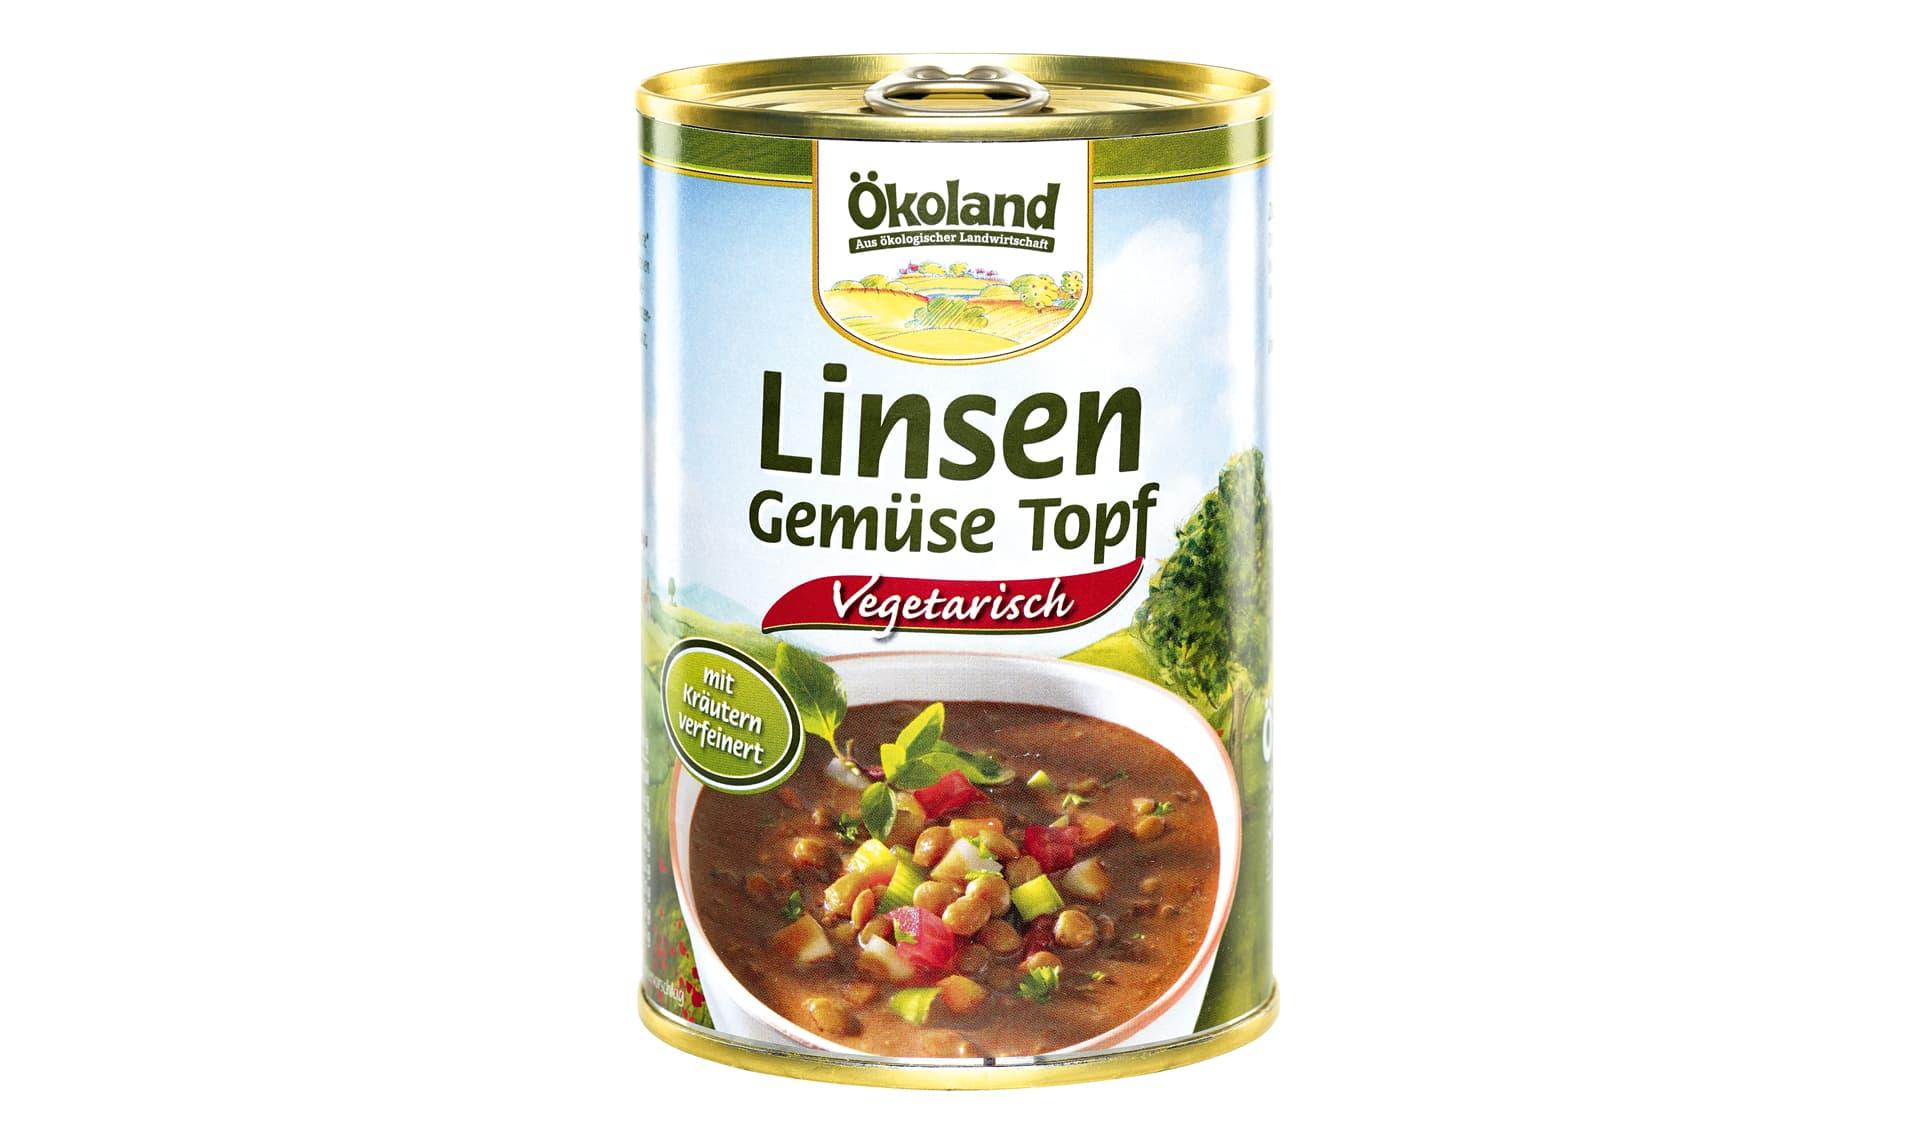 Ökoland Gemüsetopf, vegetarisch (www.oekoland.de)